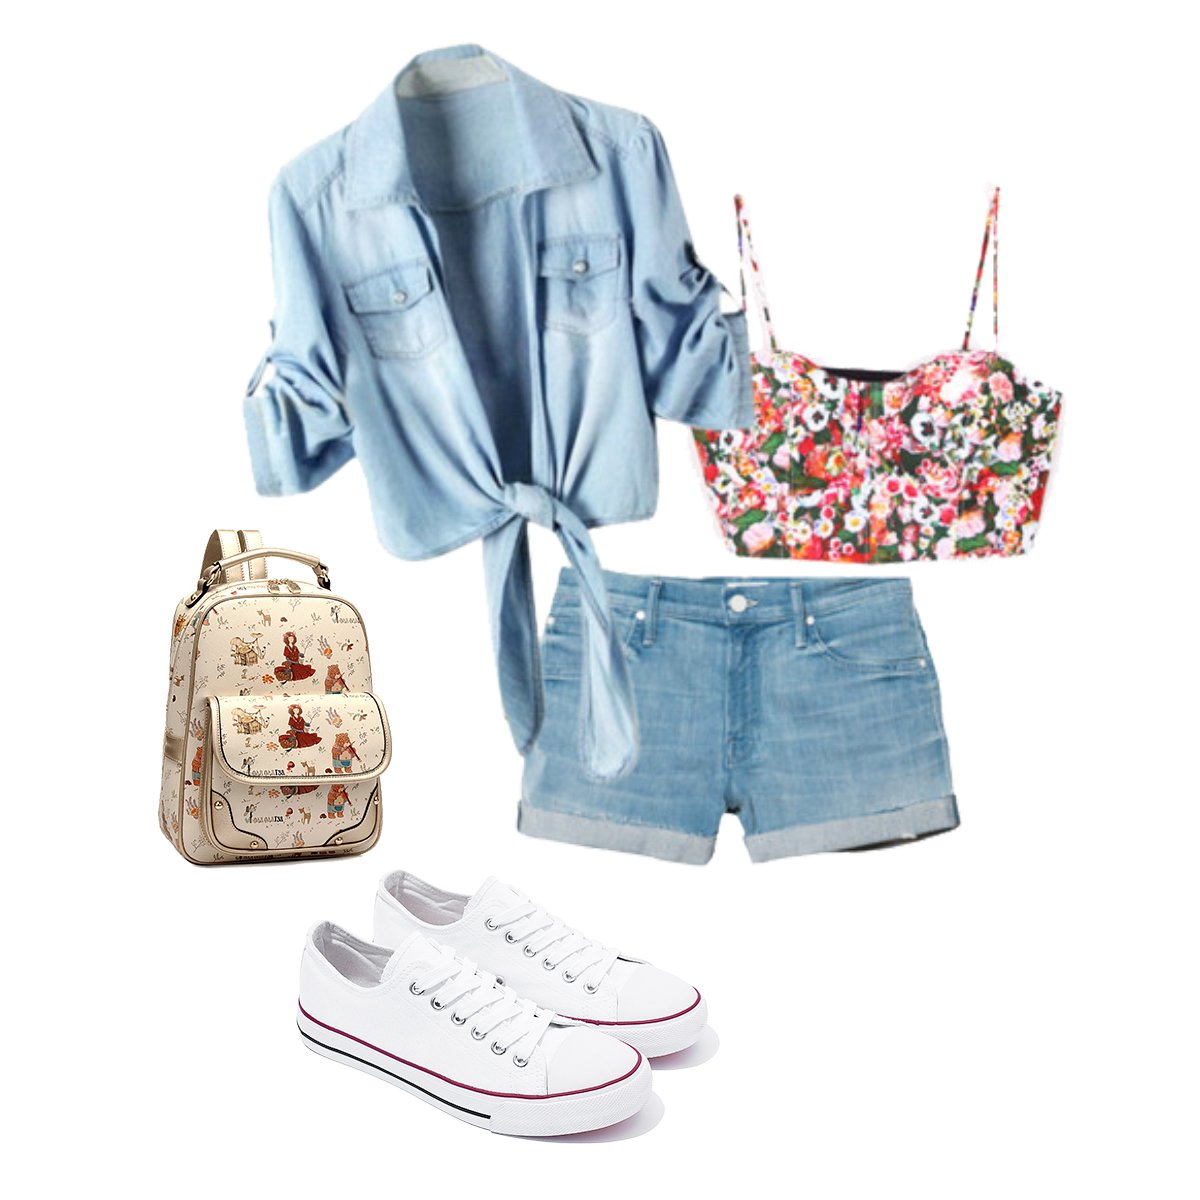 AOMAIS Womens Canvas Shoes Sneaker Low Top Lace up Fashion Walking Shoes (US7, white1) … by AOMAIS (Image #7)